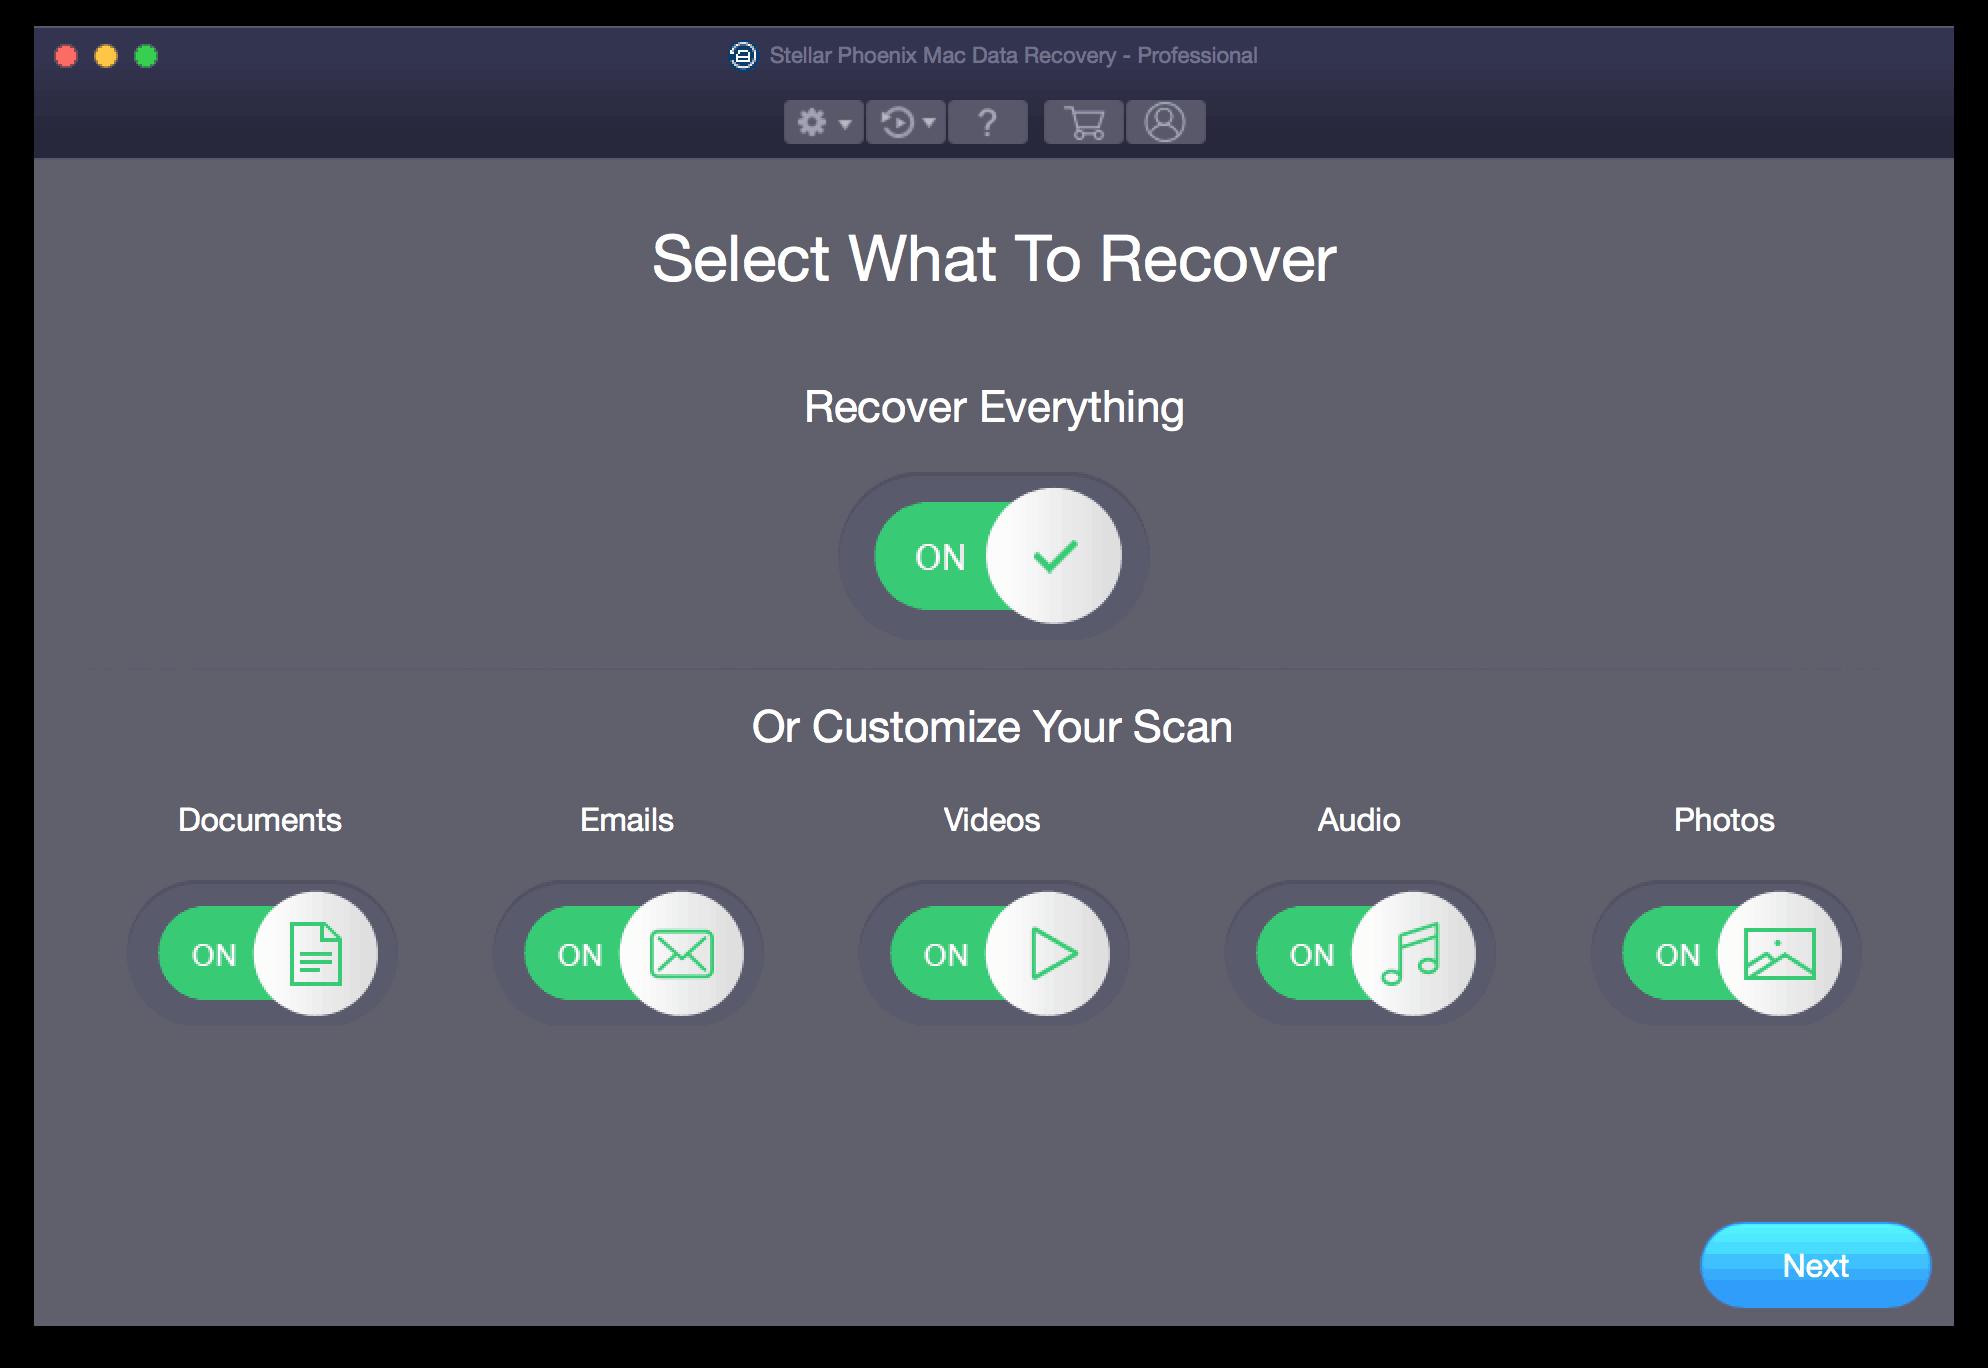 Stellar-Phoenix-Mac-Data-Recovery-Professional